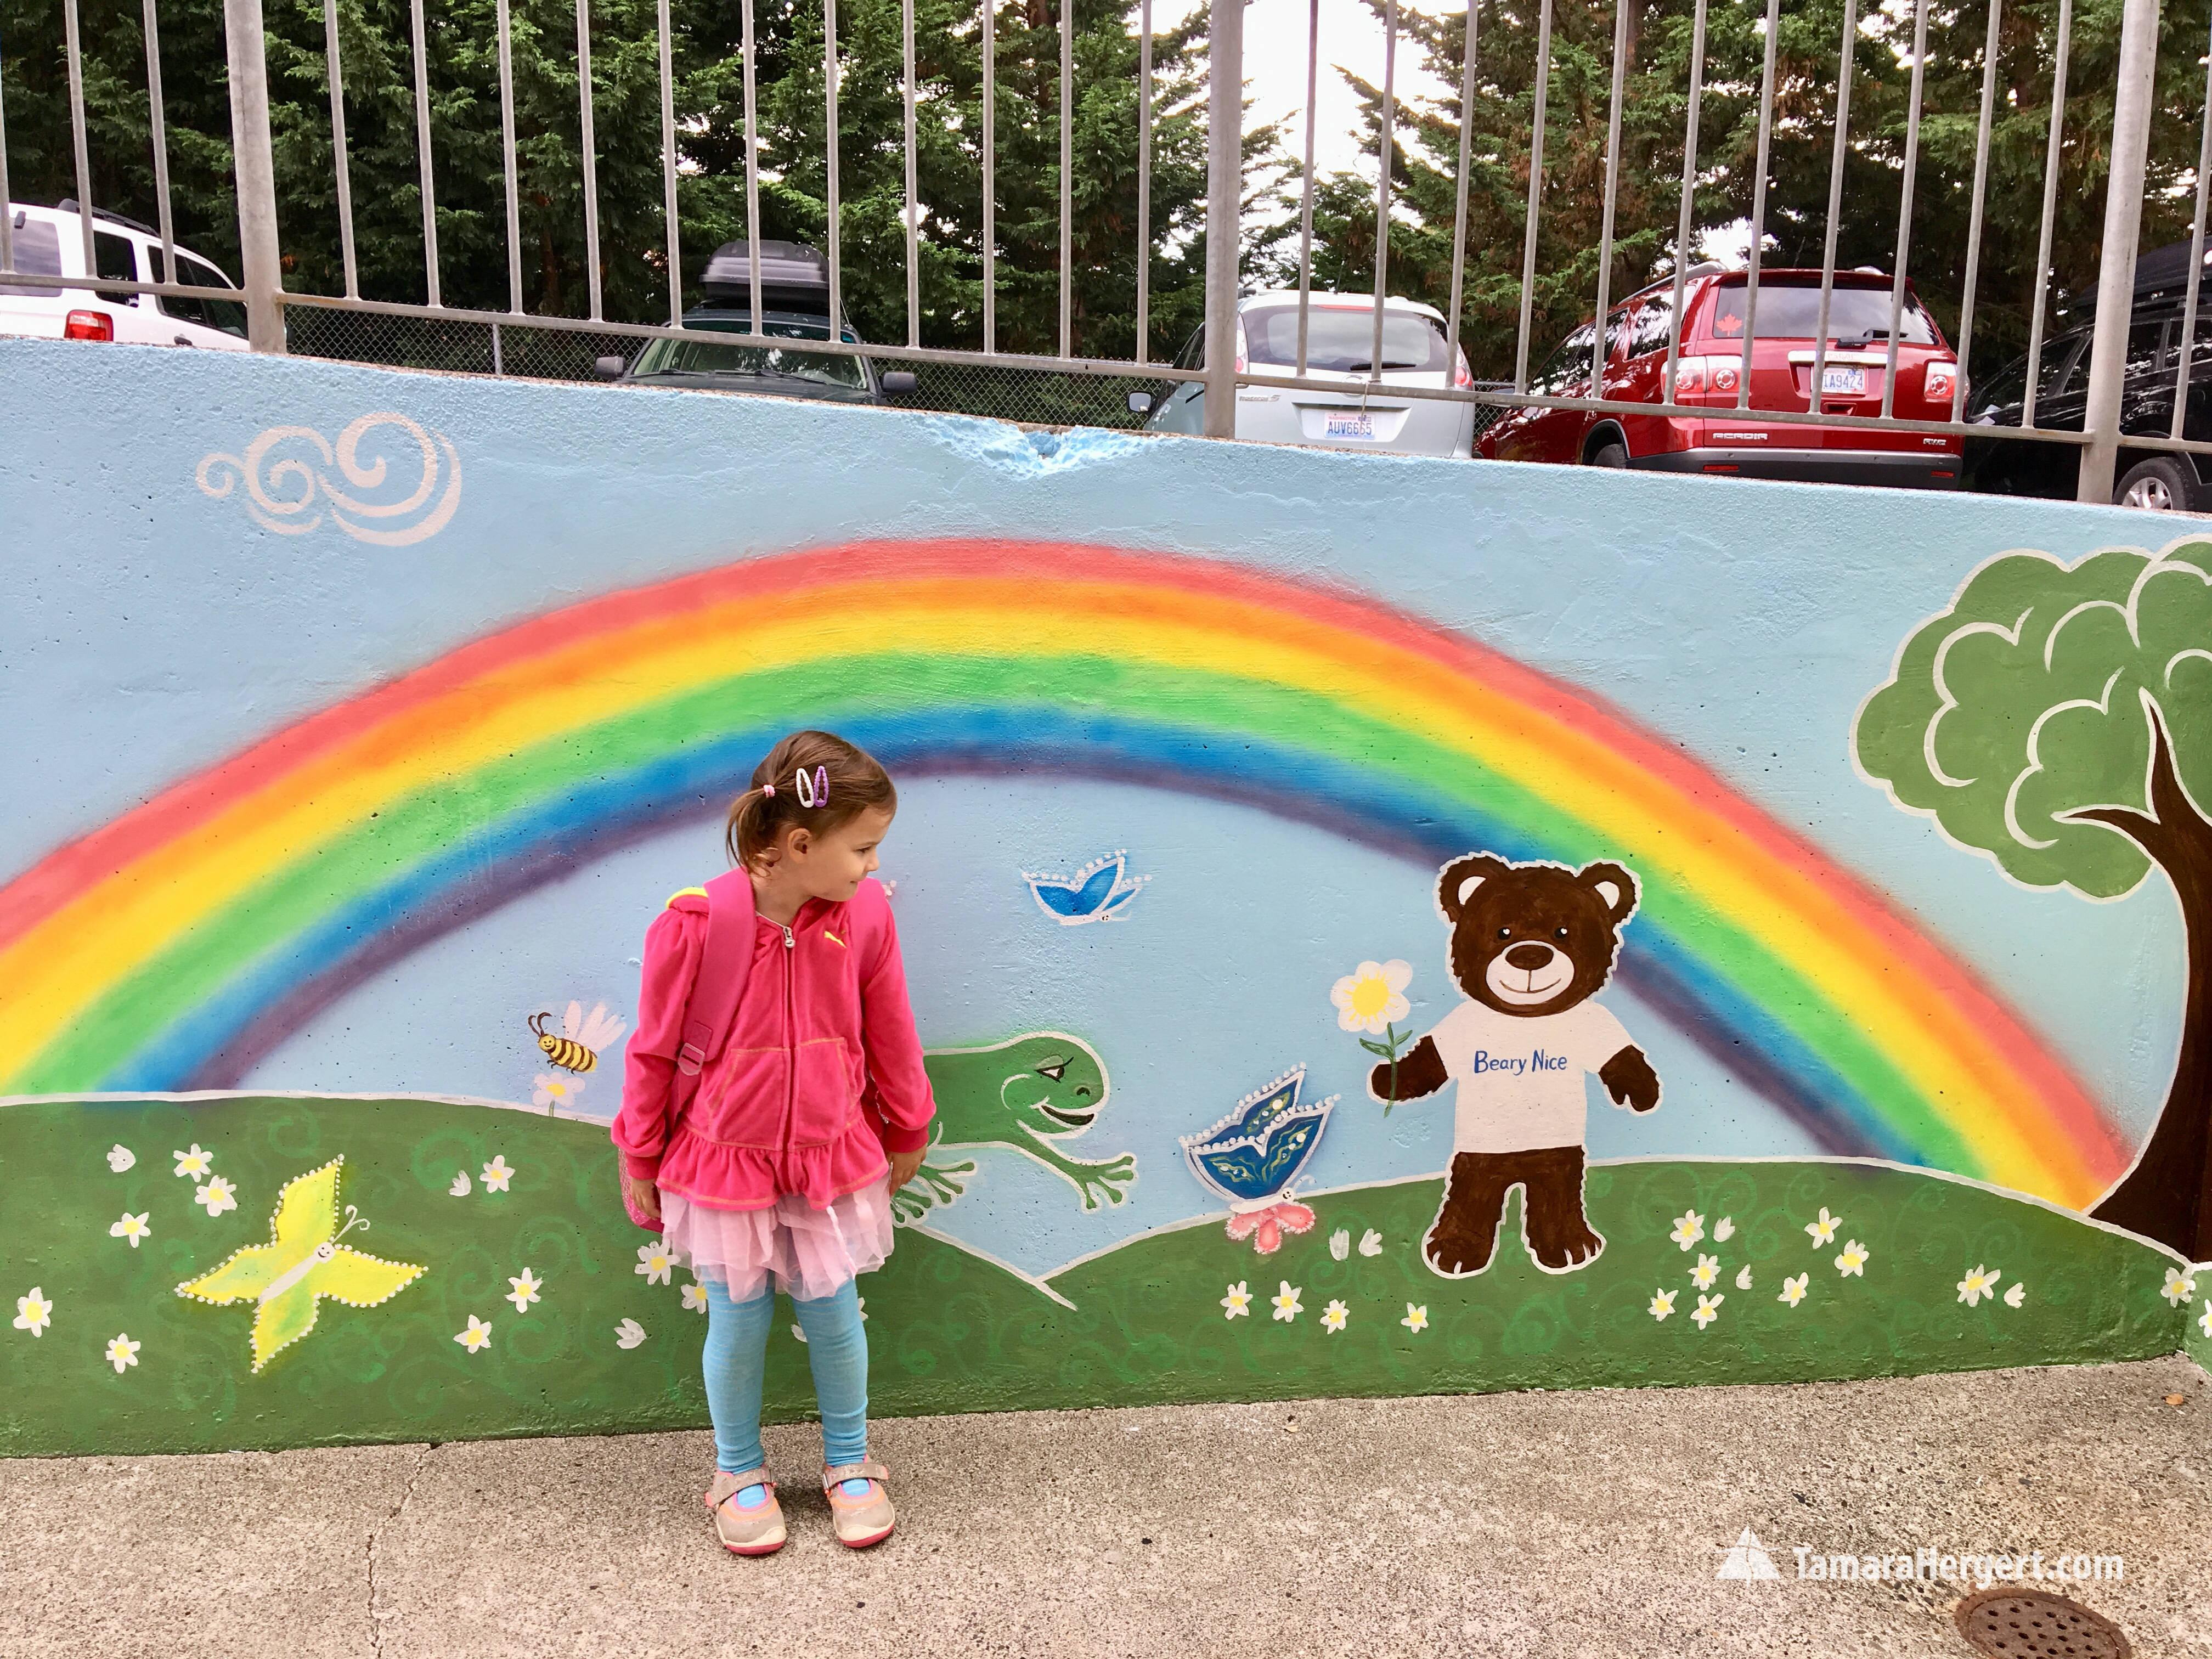 South Preschool mural by Tamara Hergert